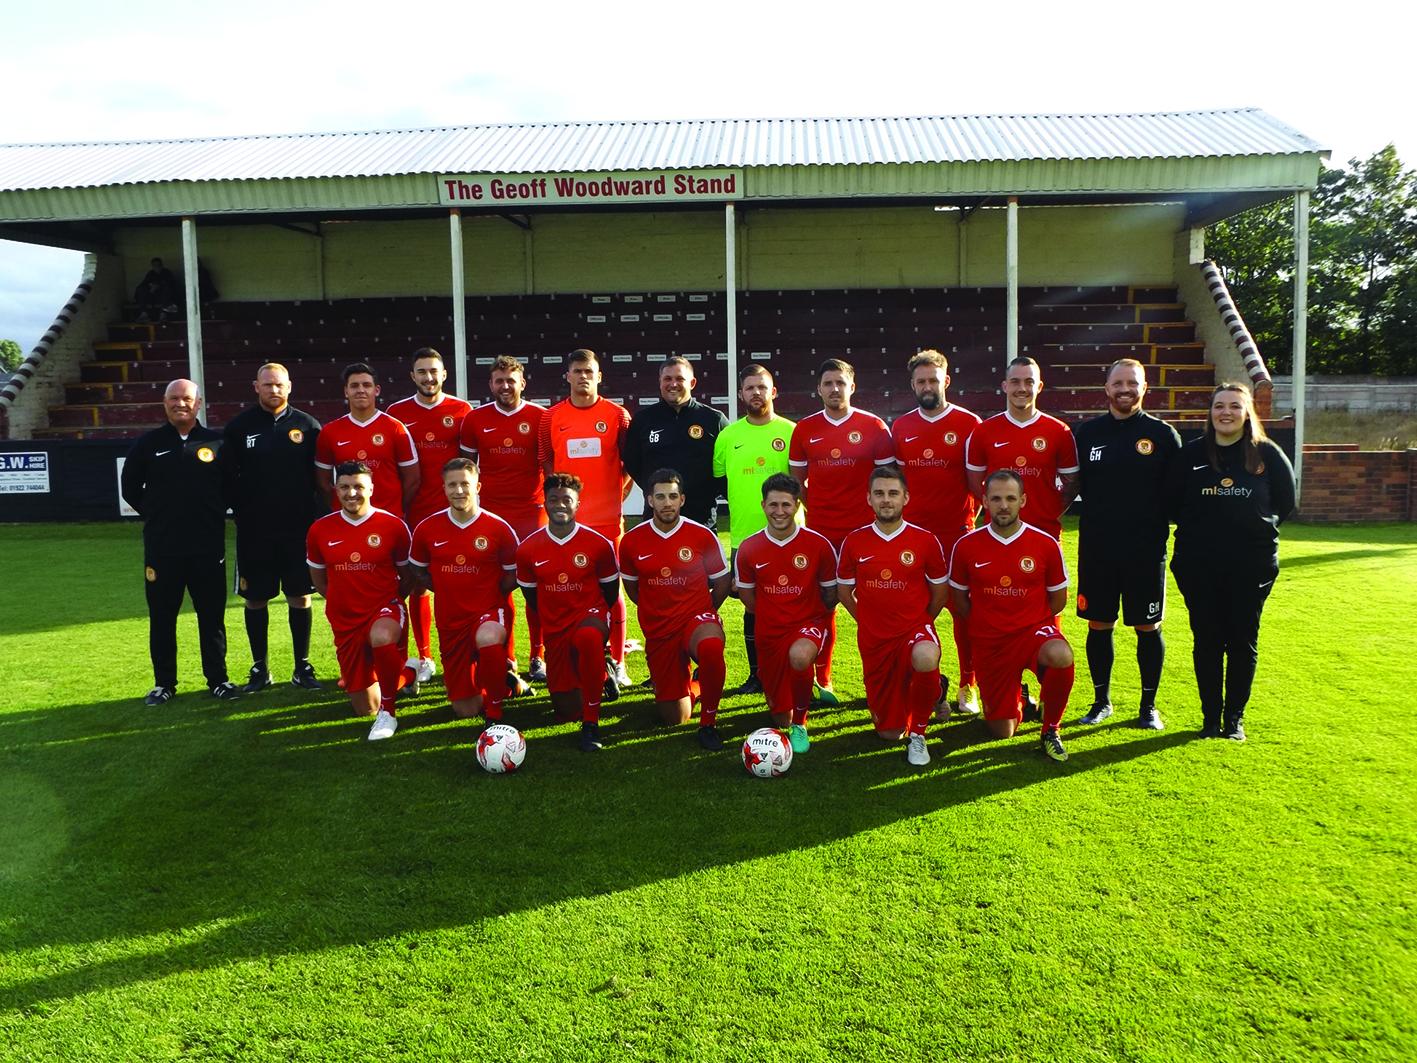 Walsall Wood Football Club